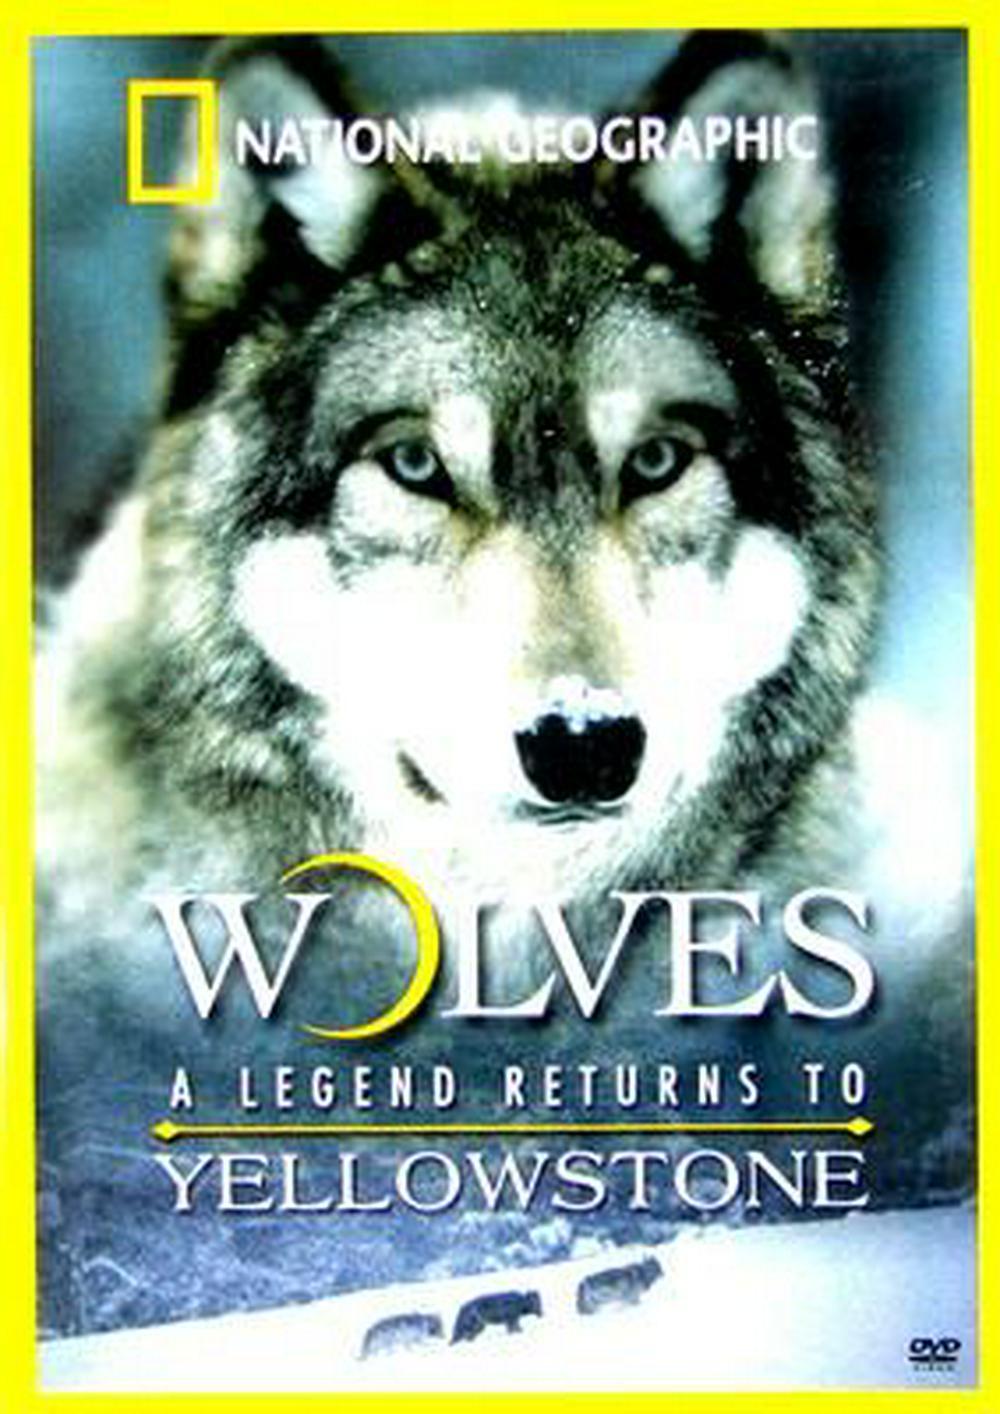 Волчья династия Йеллоустоуна - Yellowstone Wolf Dynasty